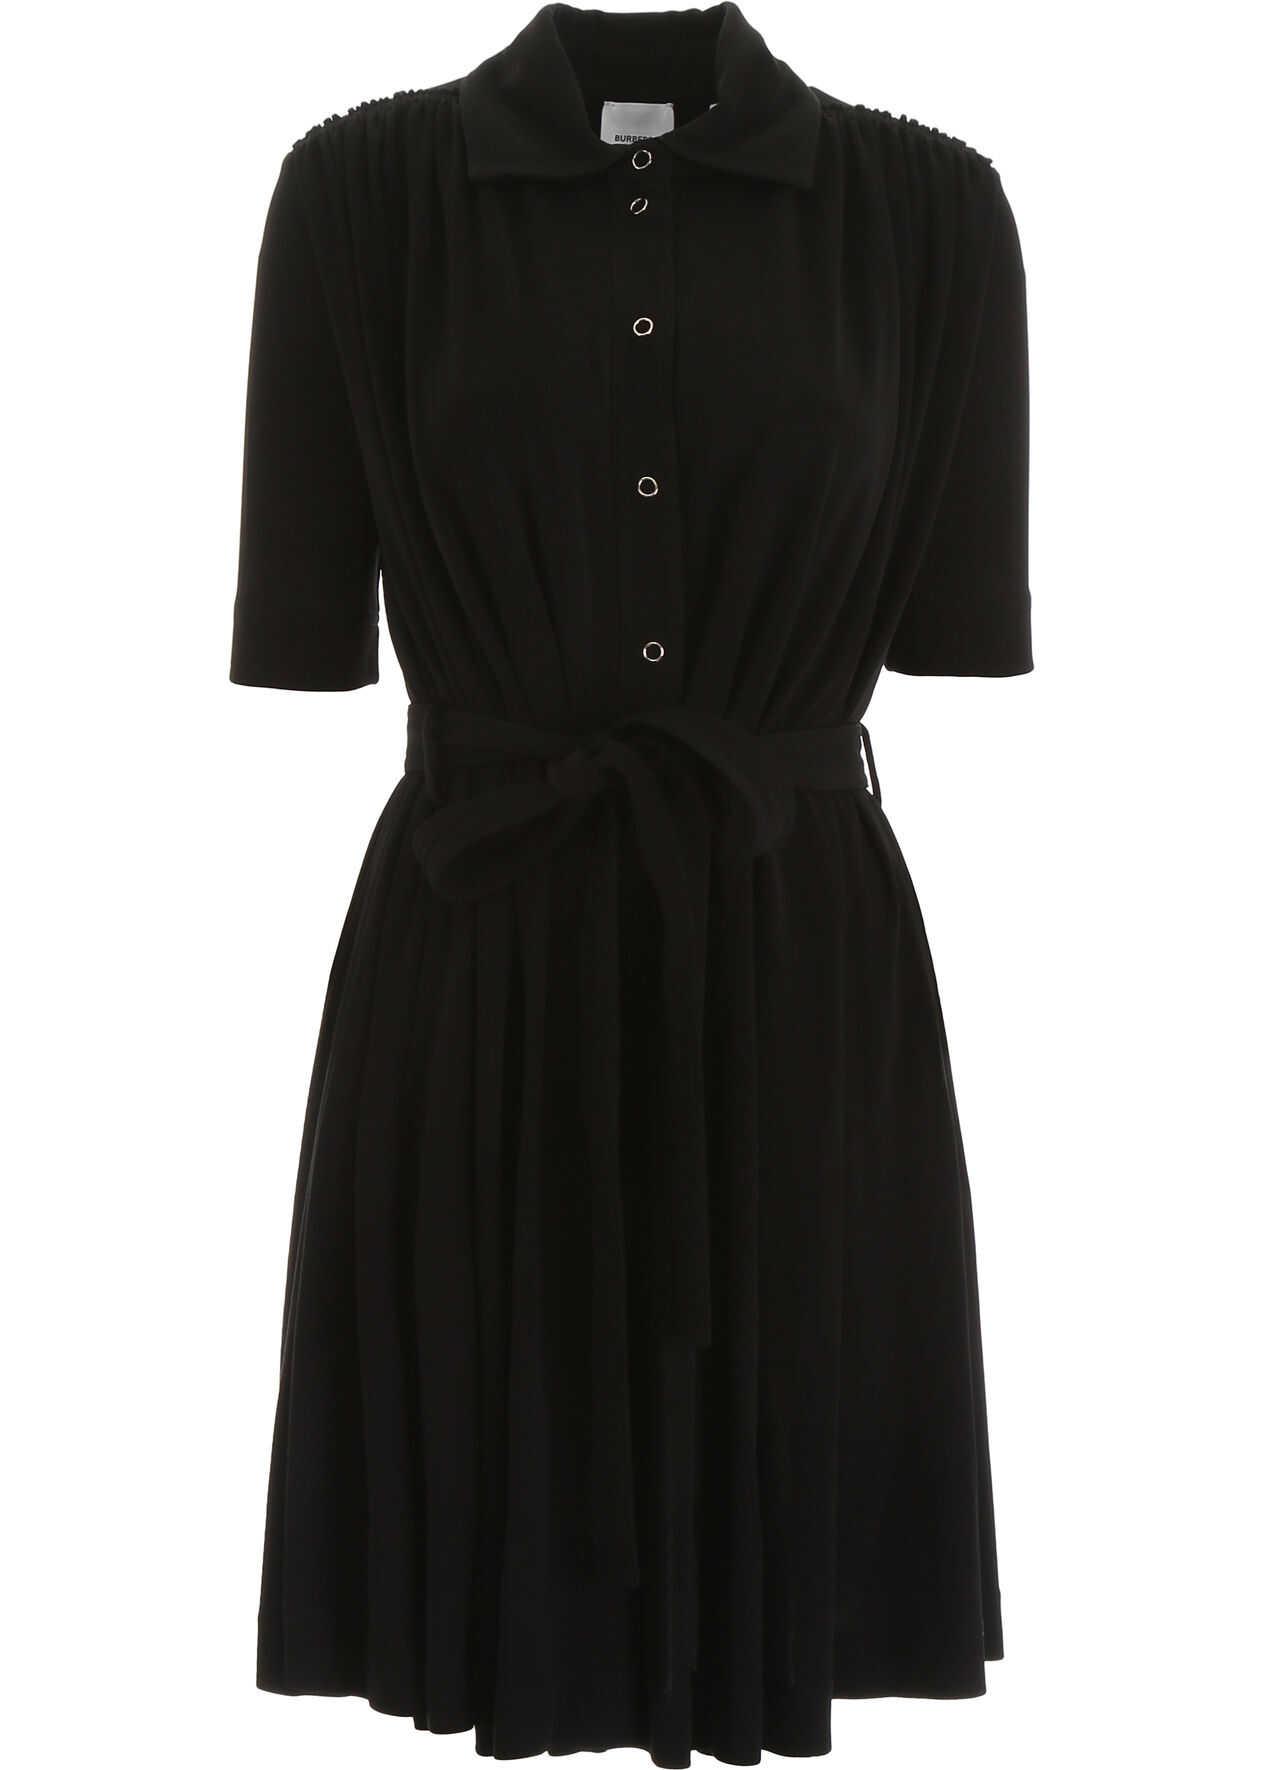 Burberry Cammie Dress BLACK